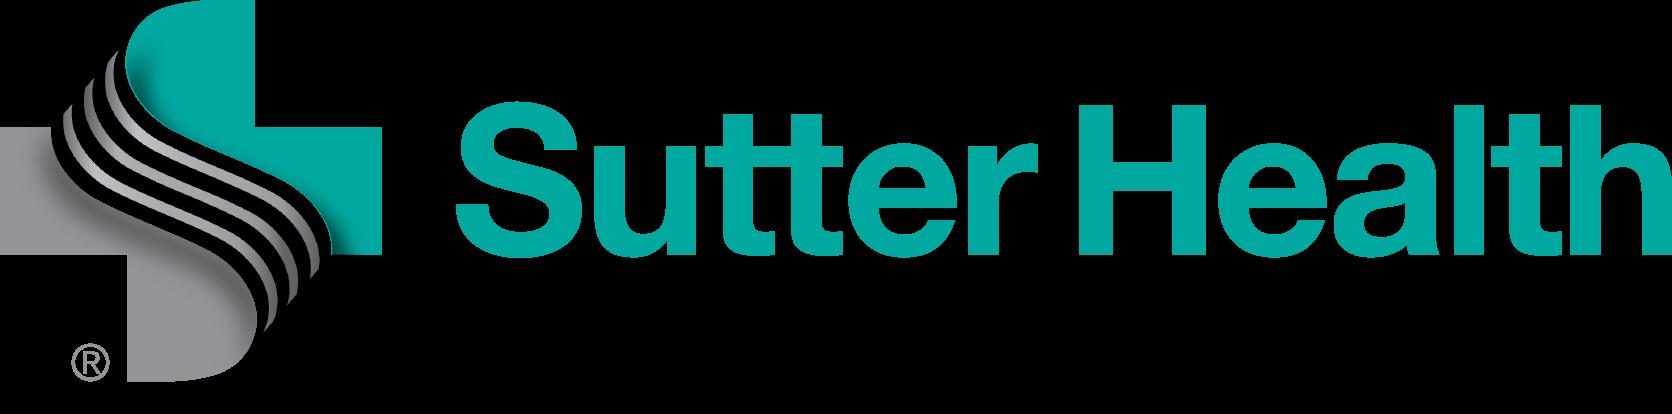 Sutter Health Logo png